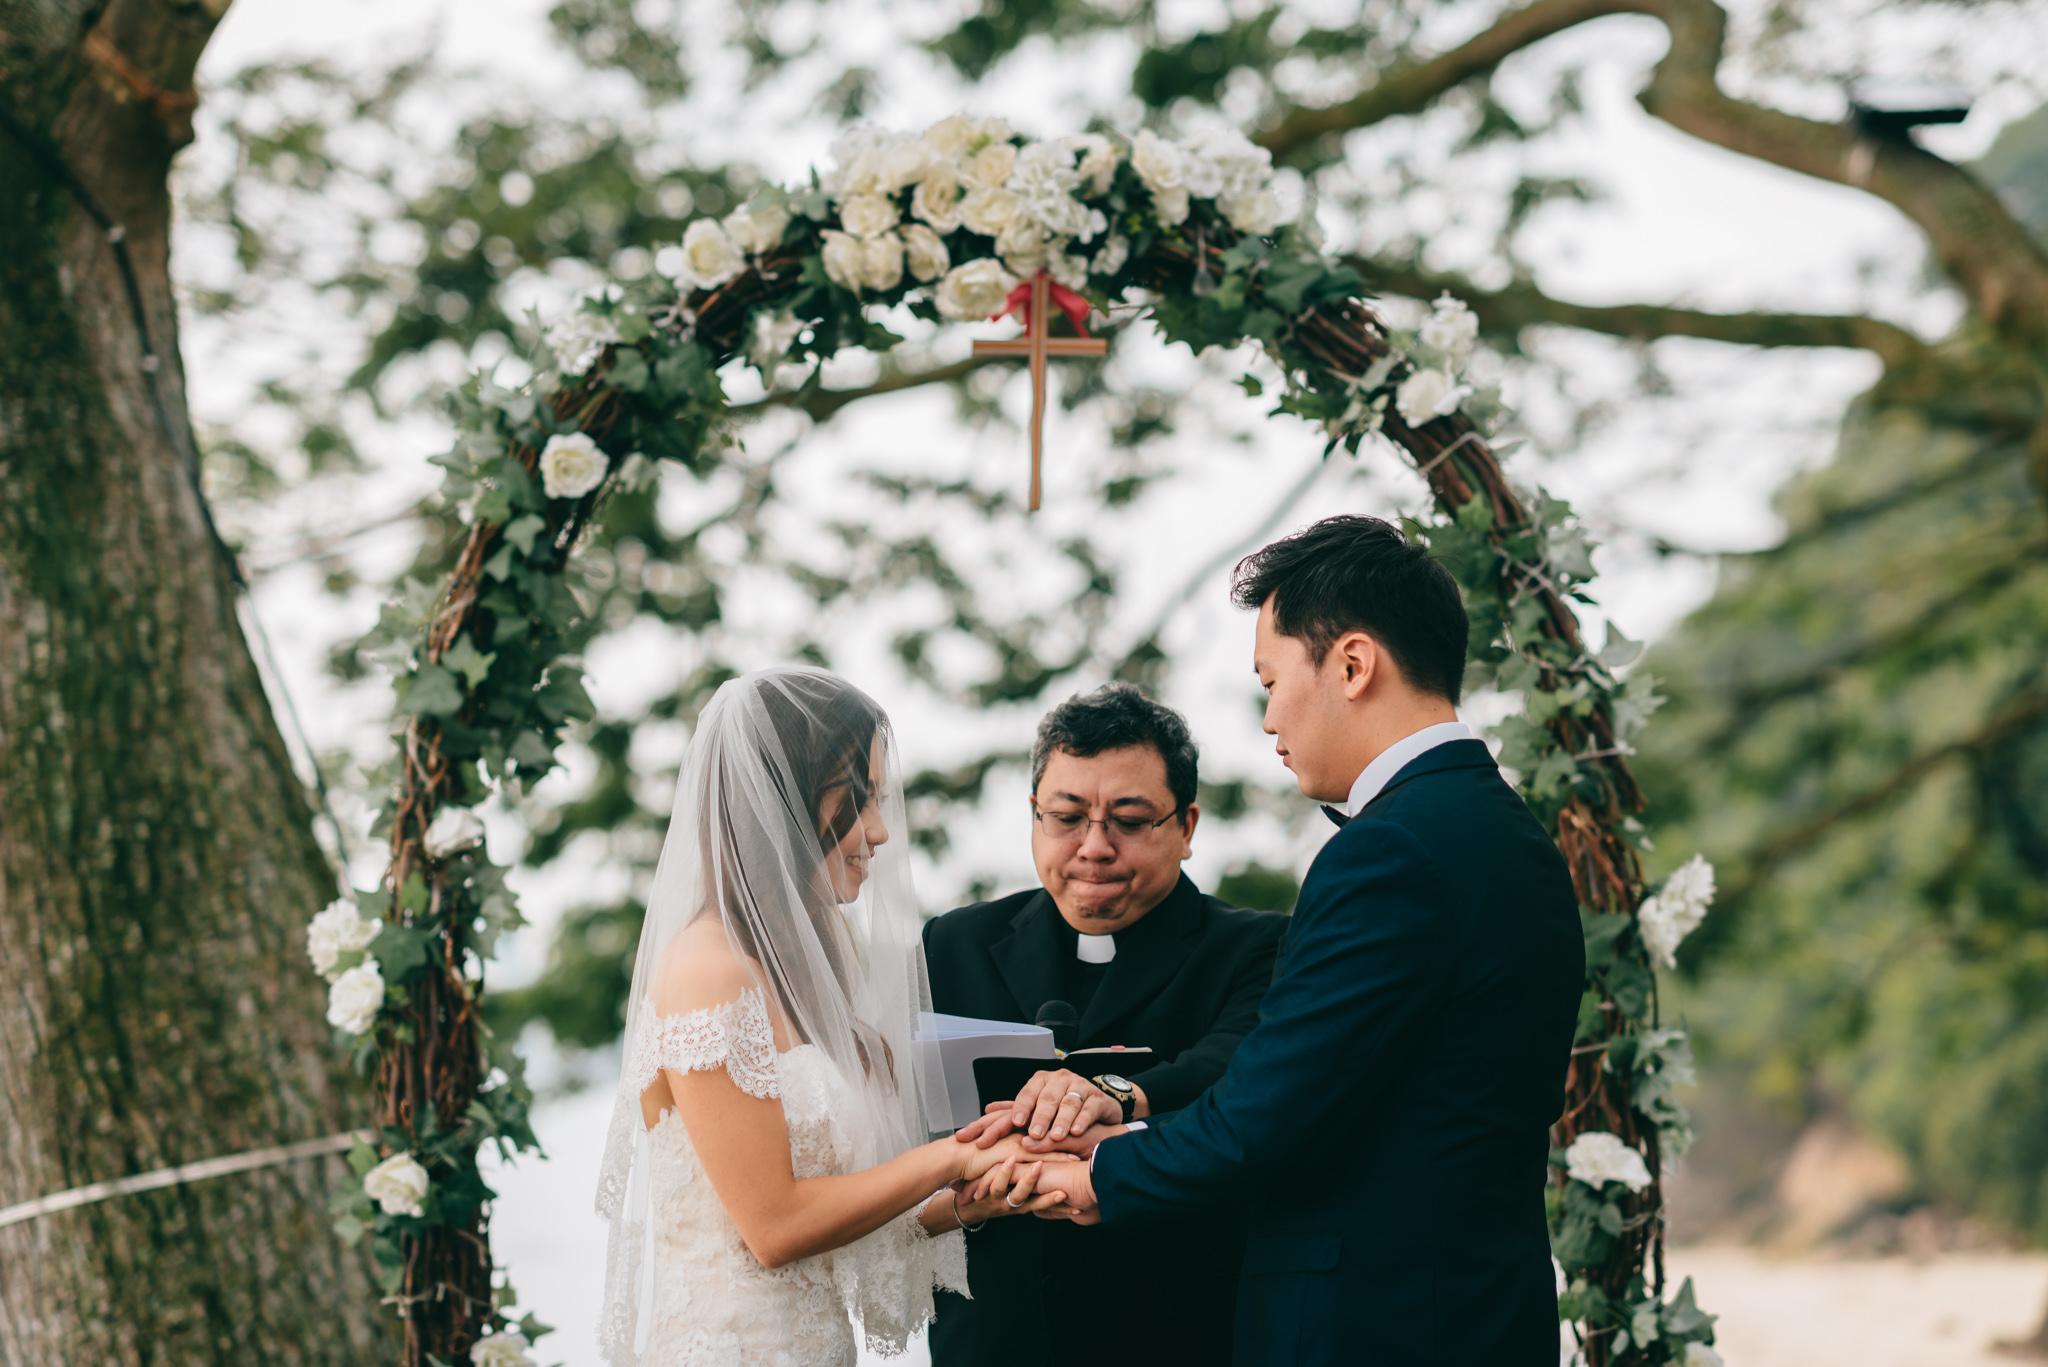 Basil & Vani Wedding Day Highlights (resized for sharing) - 116.jpg